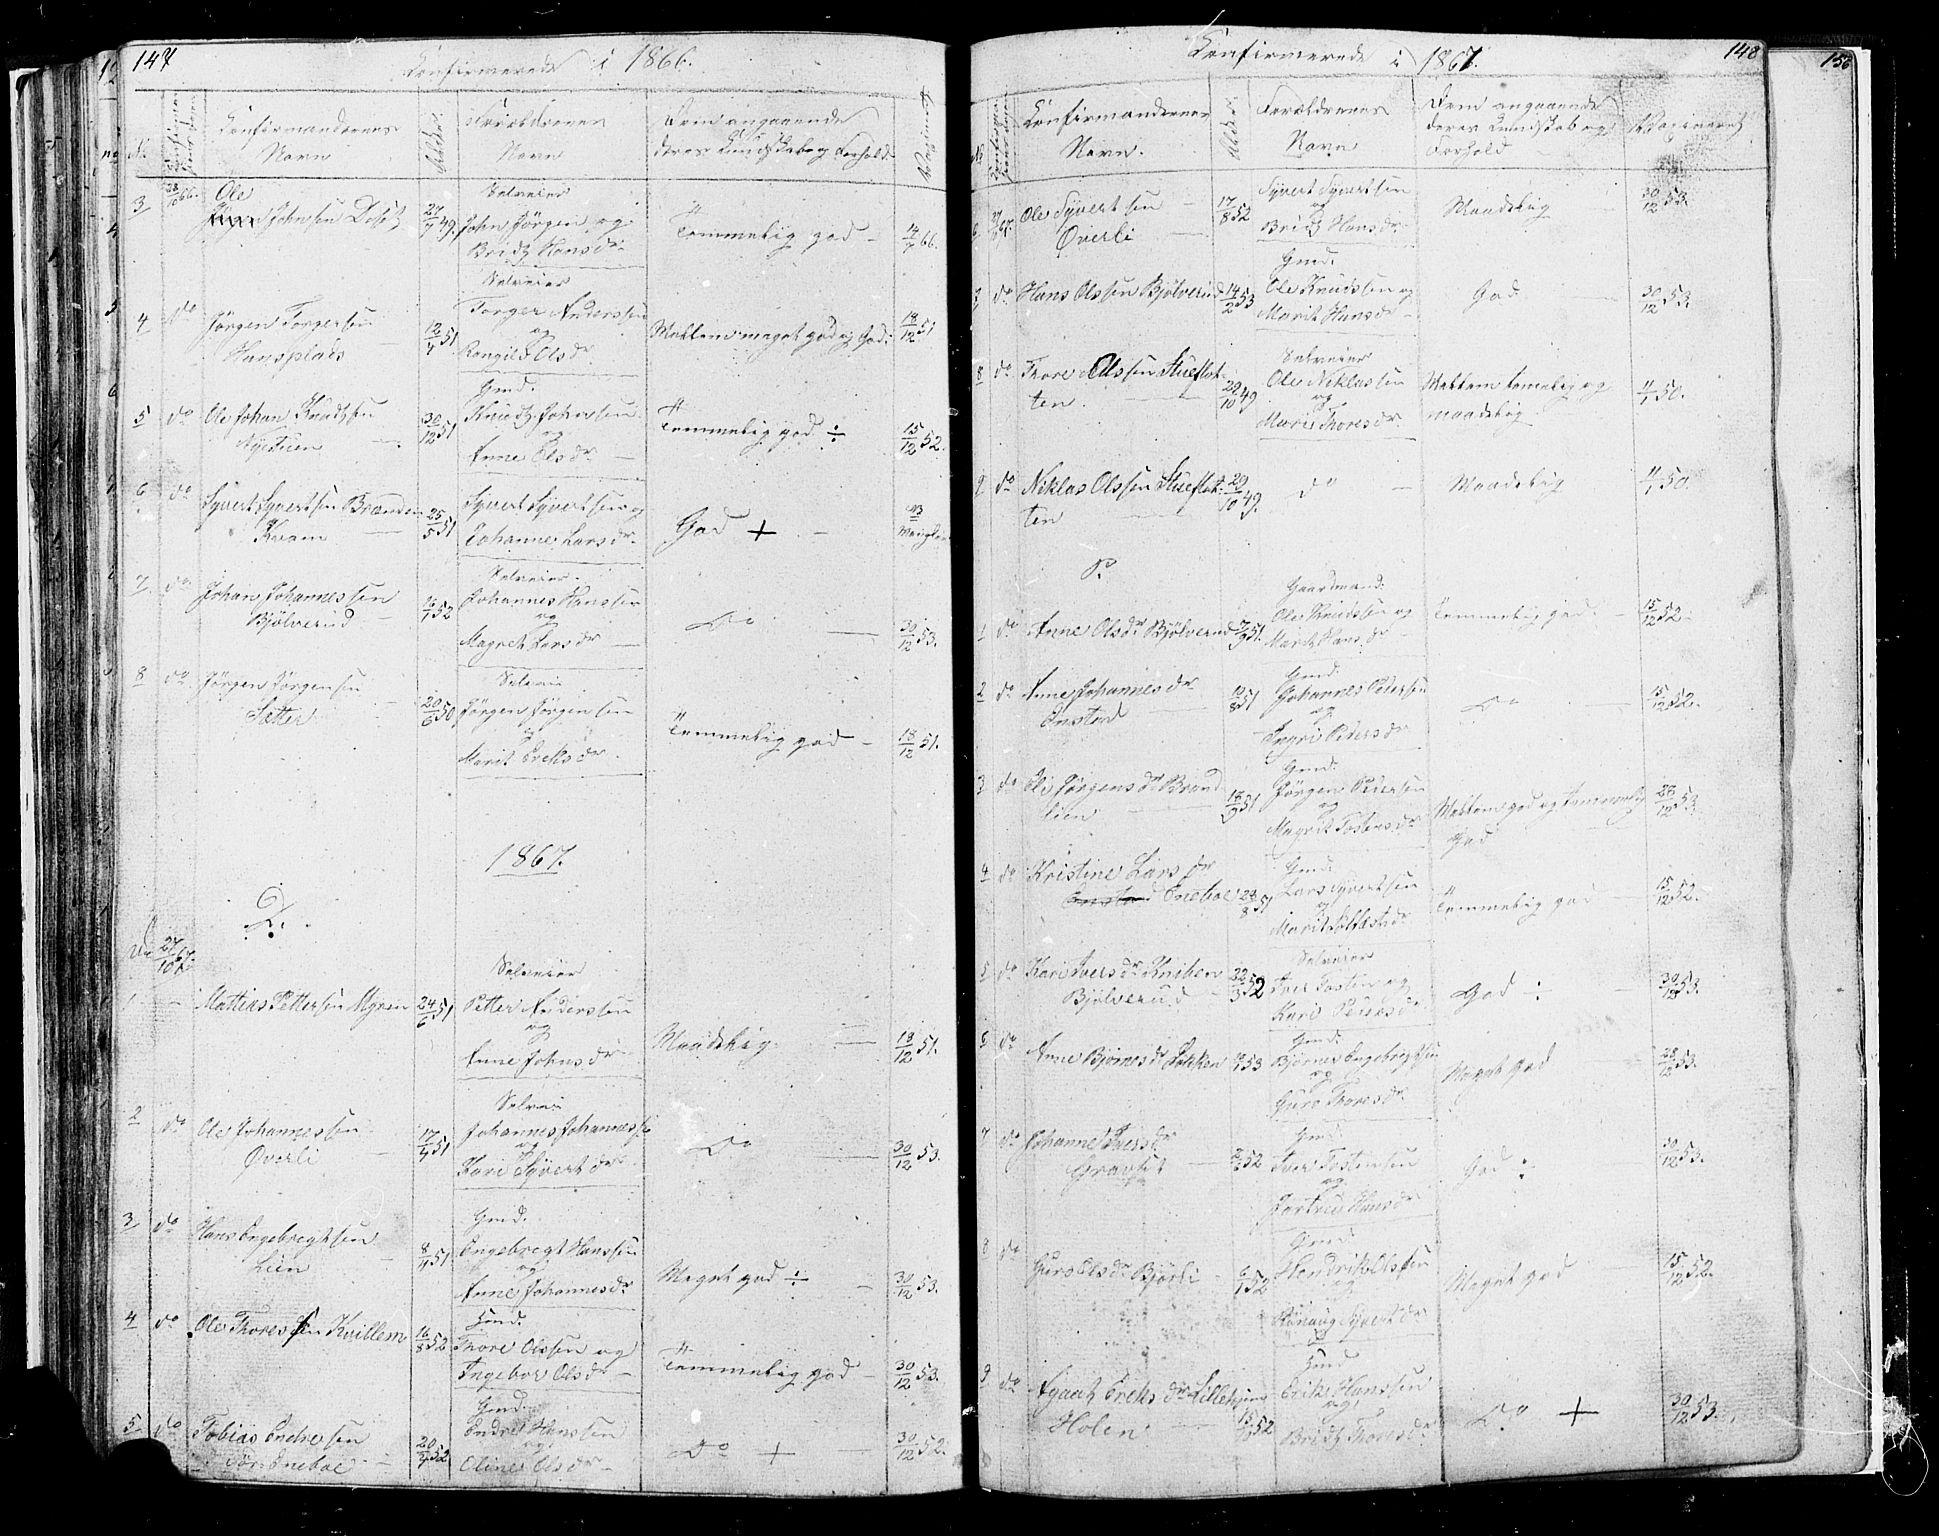 SAH, Lesja prestekontor, Klokkerbok nr. 4, 1842-1871, s. 147-148